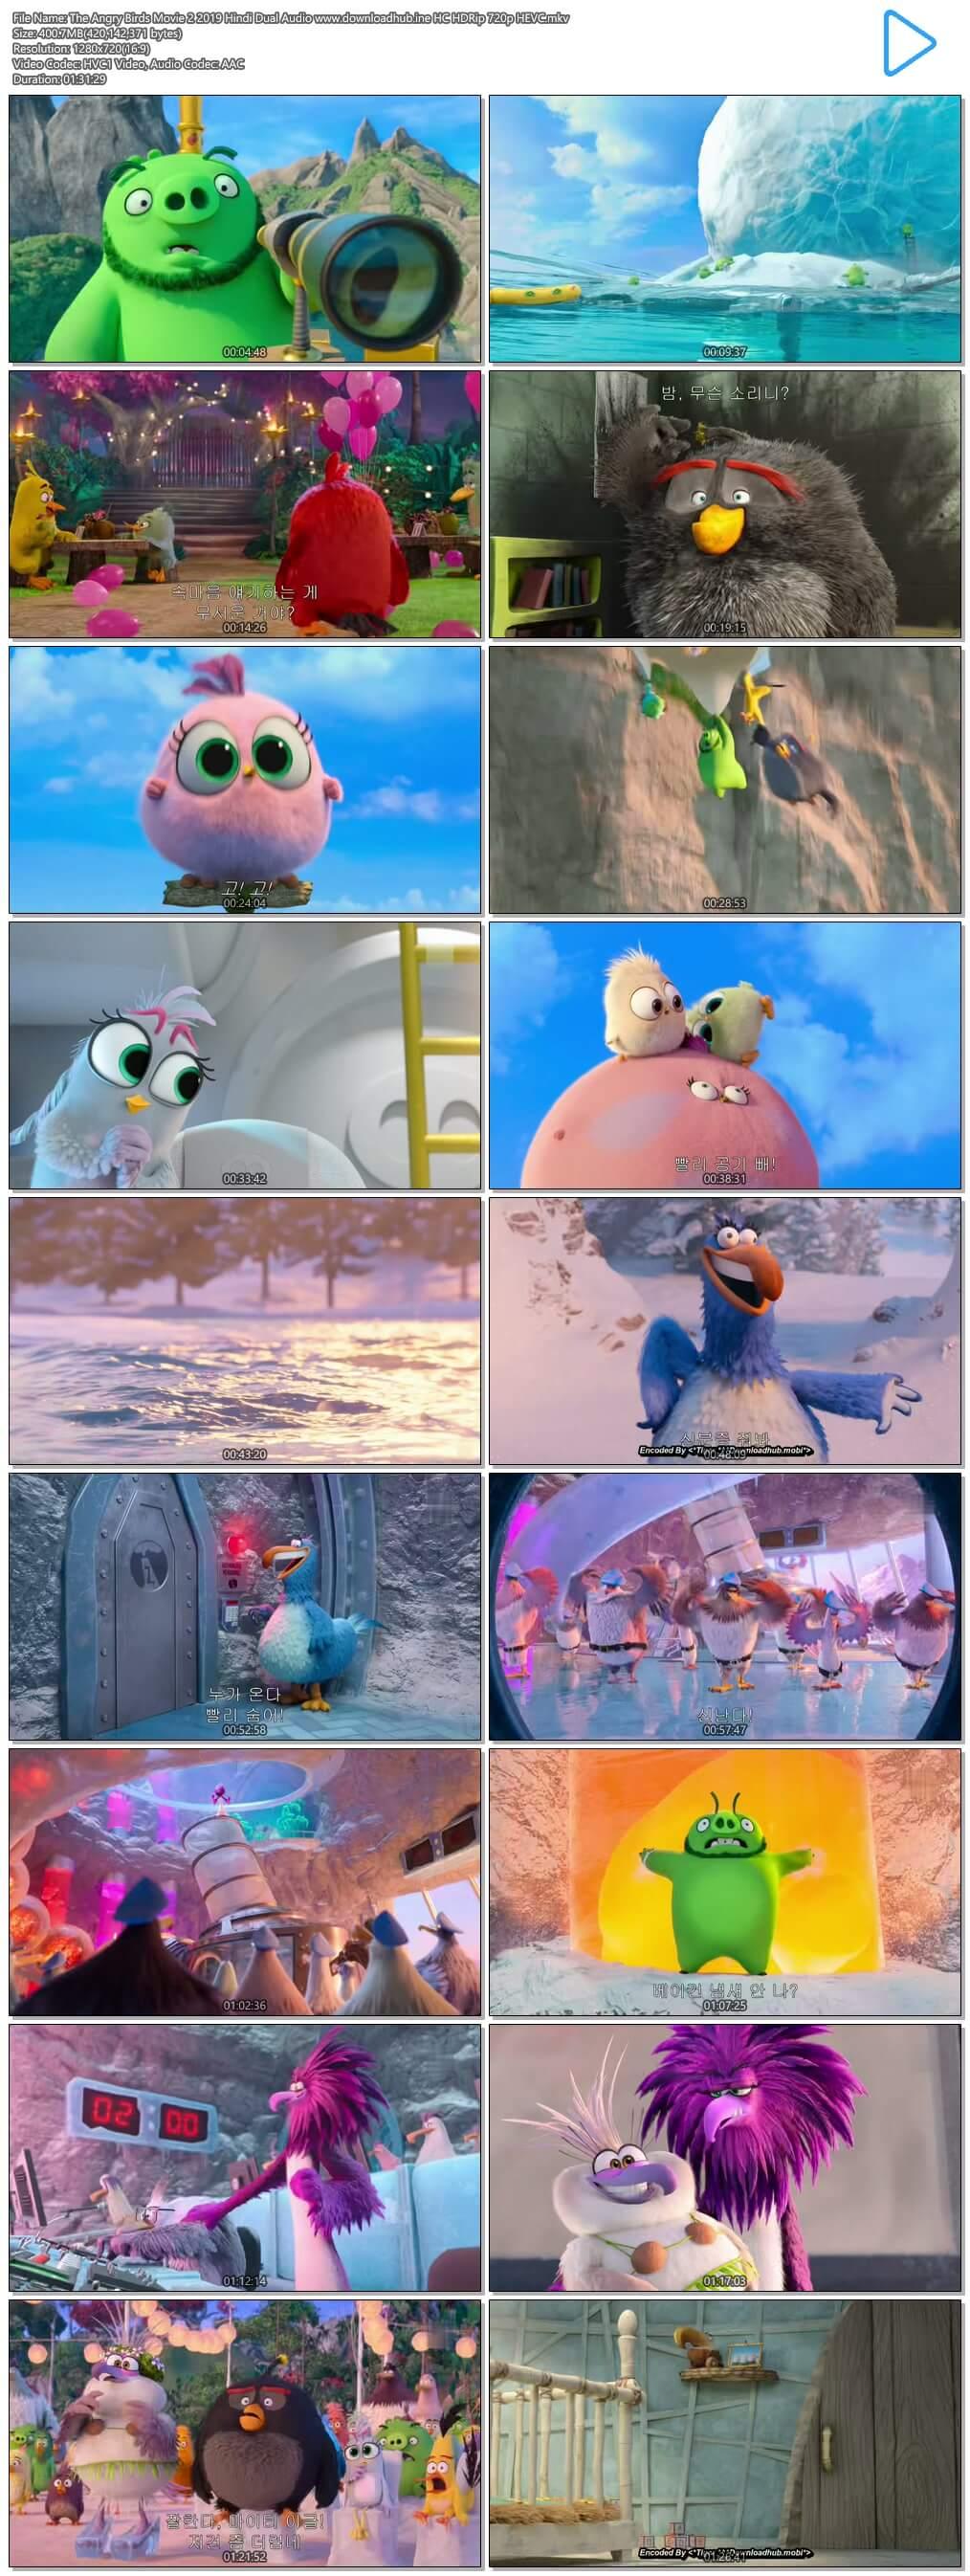 The Angry Birds Movie 2 2019 Hindi Dual Audio 400MB HC HDRip 720p HEVC